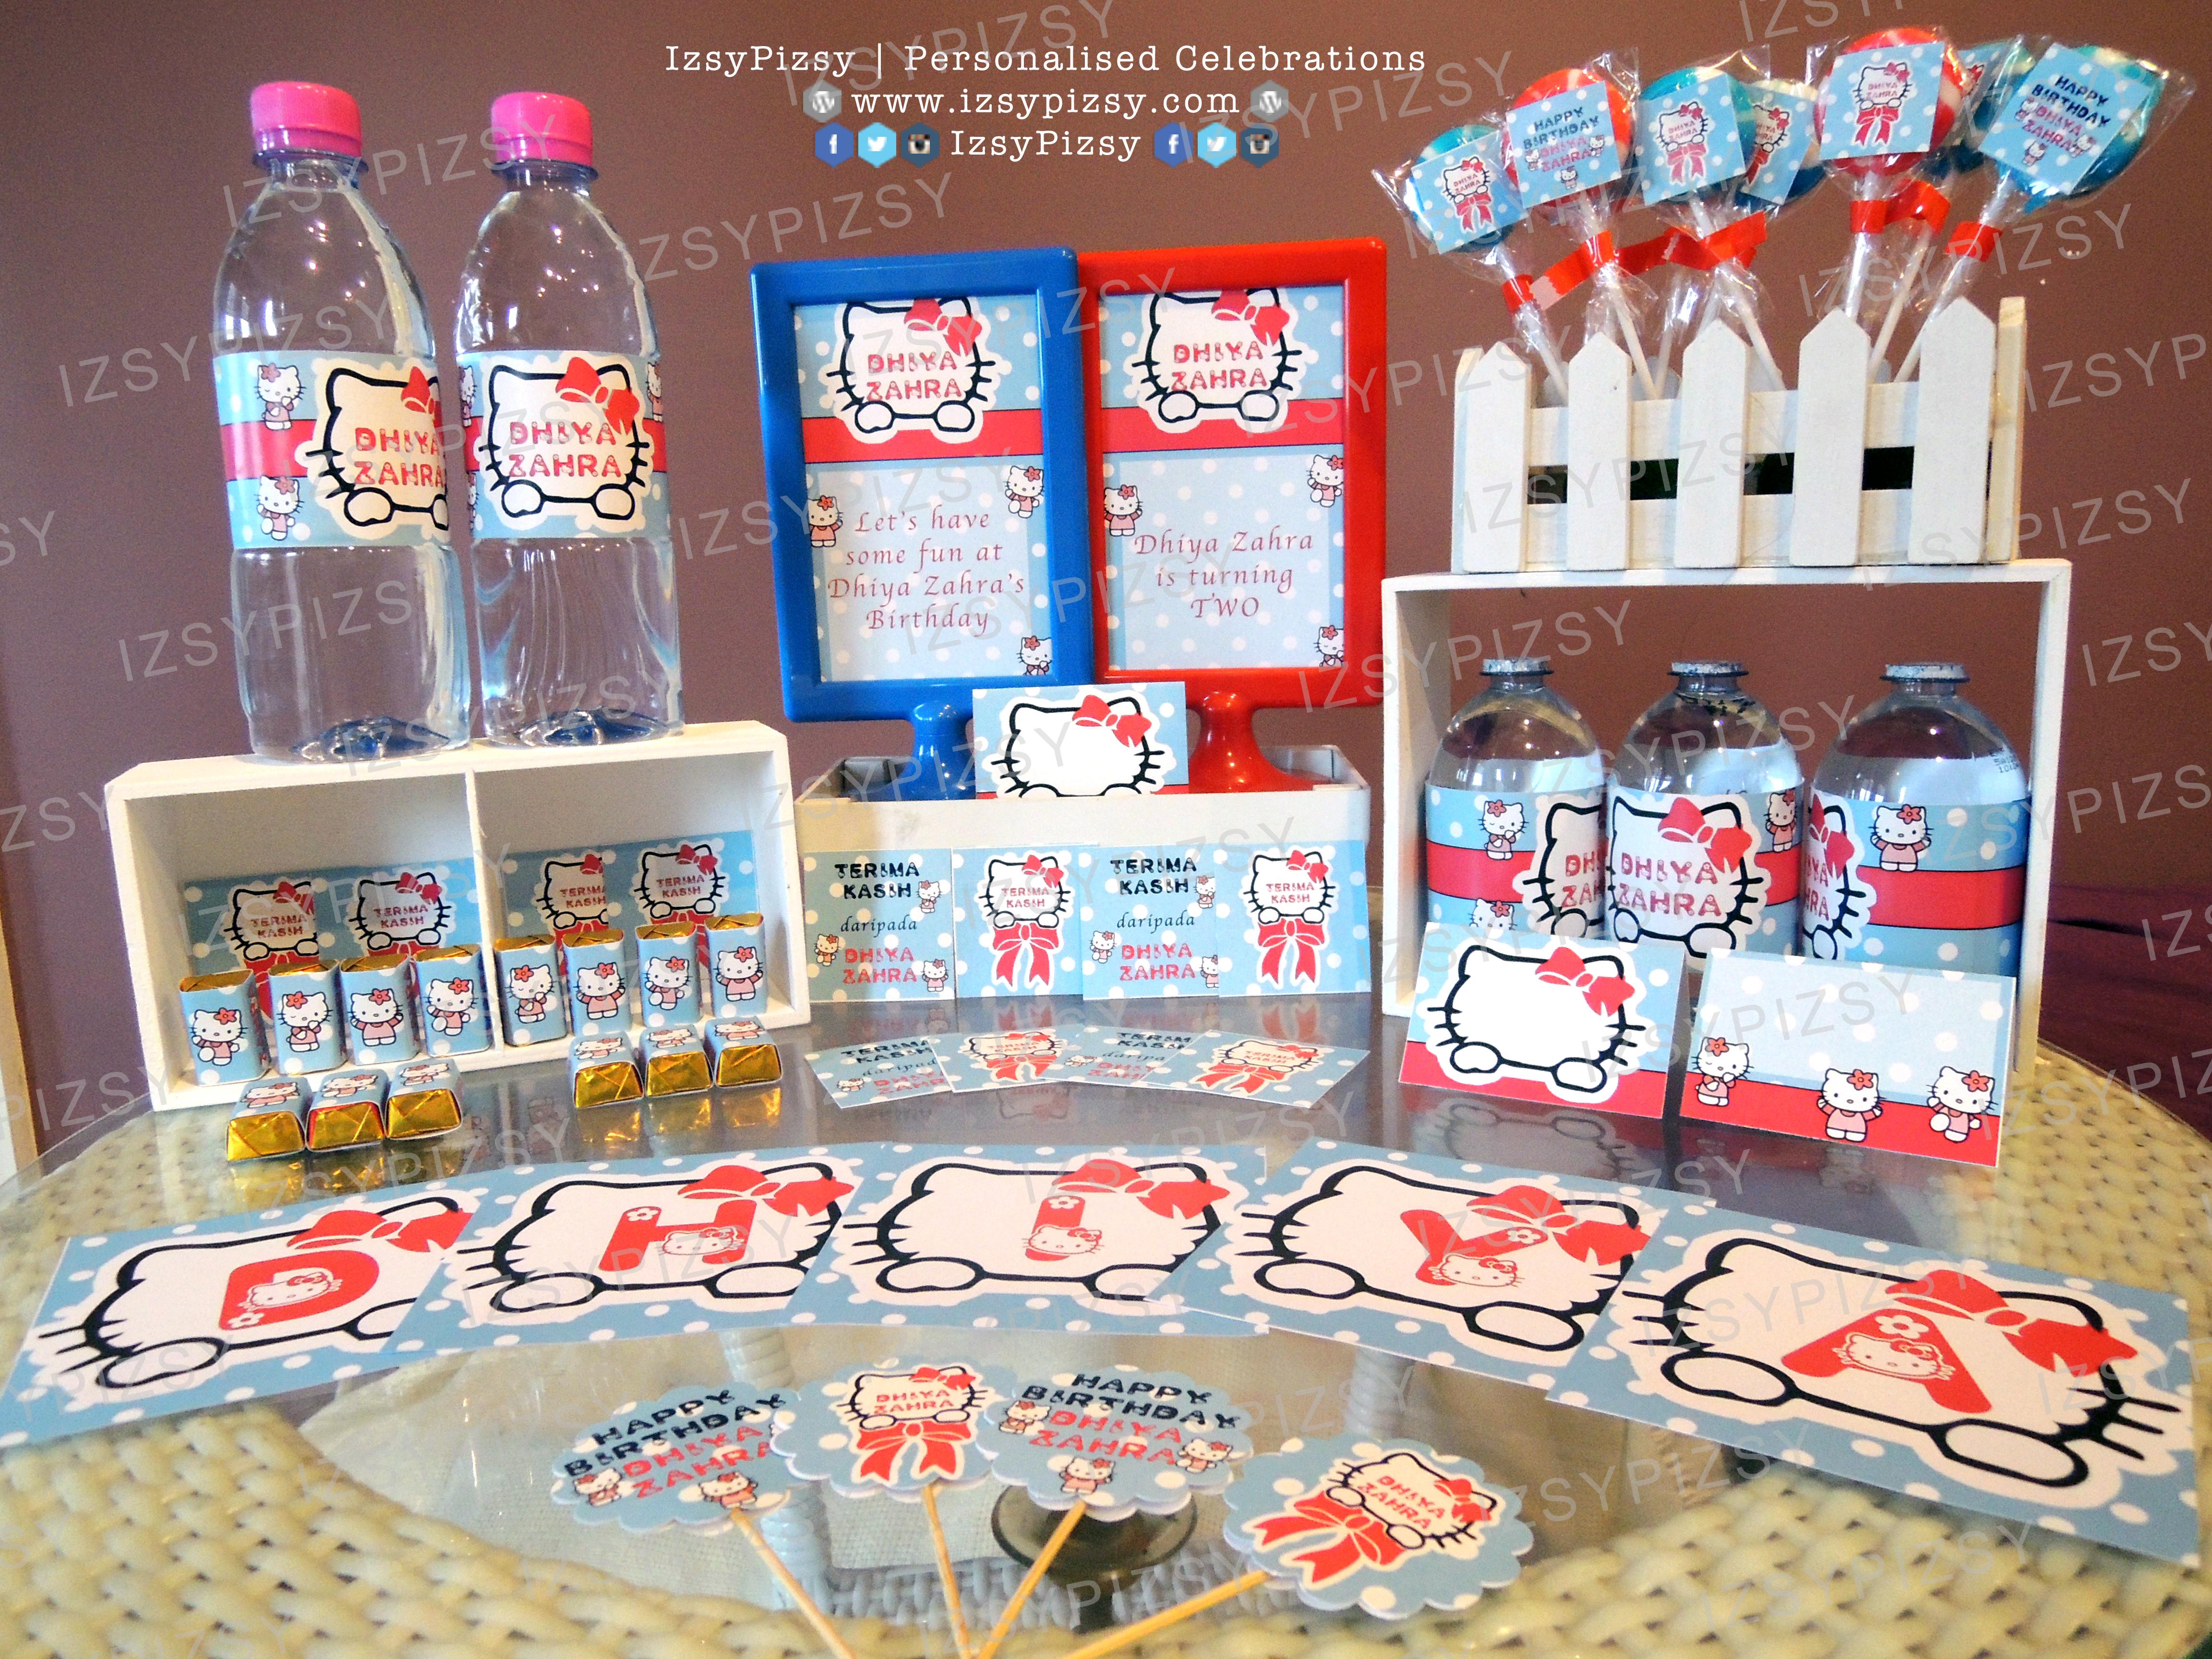 Hello Kitty theme for Dhiya Zahra's 2nd Birthday Party.